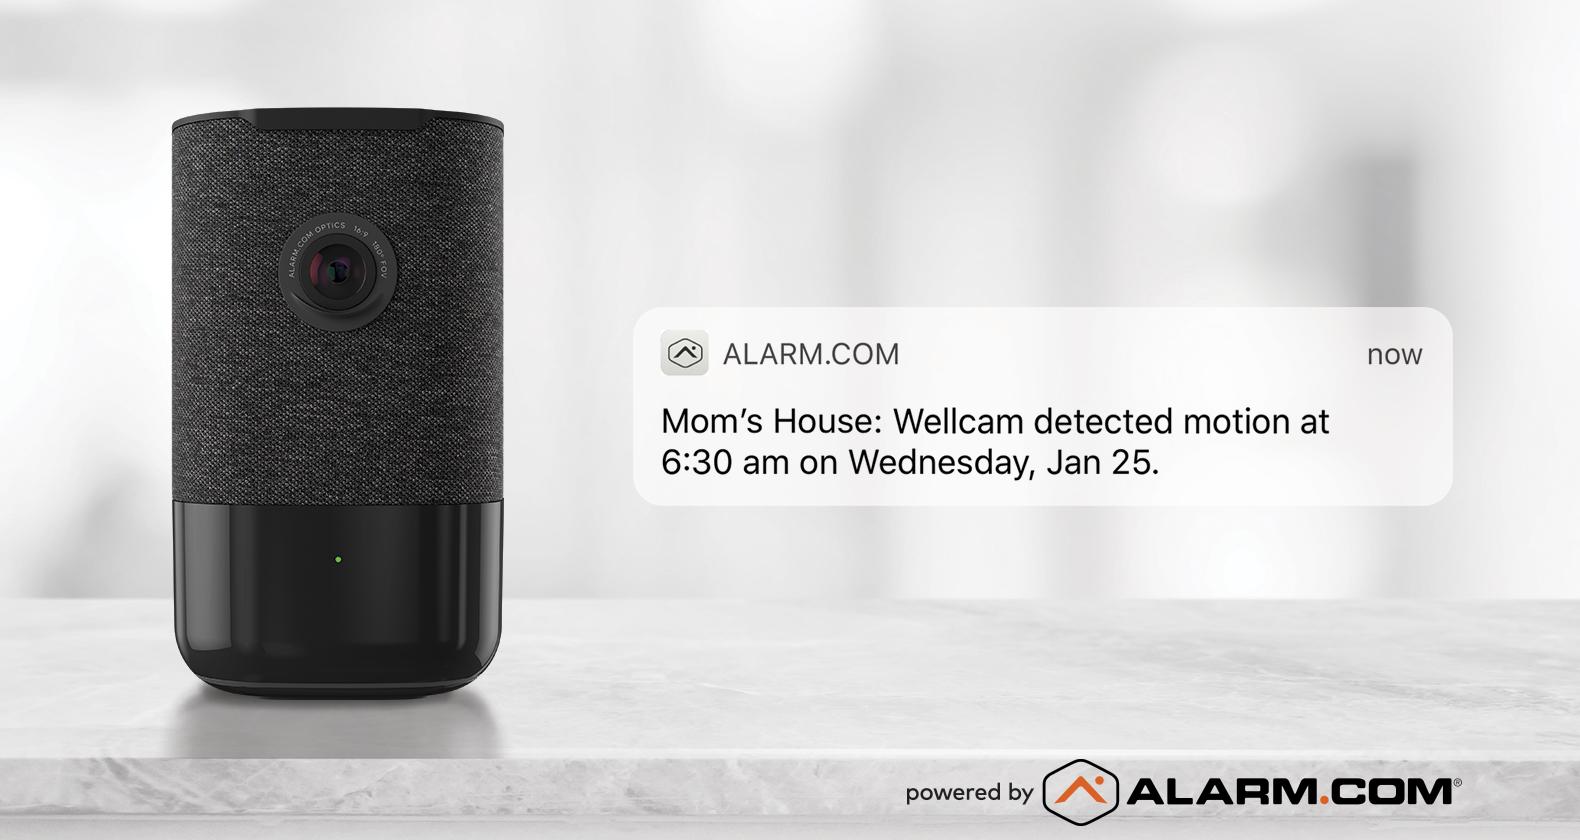 Alarm.com Wellcam Alert FB Bl.jpg